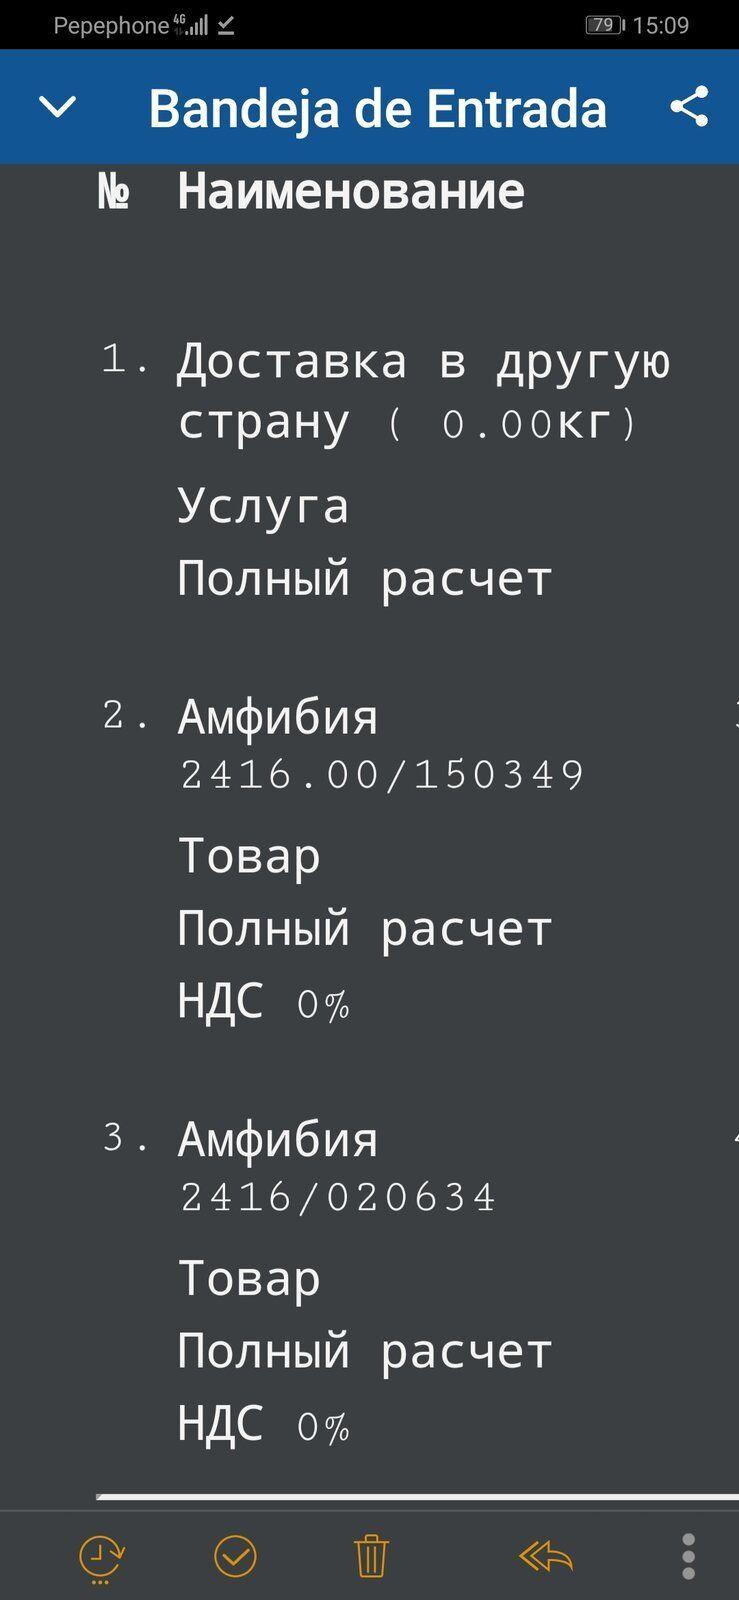 Screenshot_20210910_150927_me.bluemail.mail.jpg